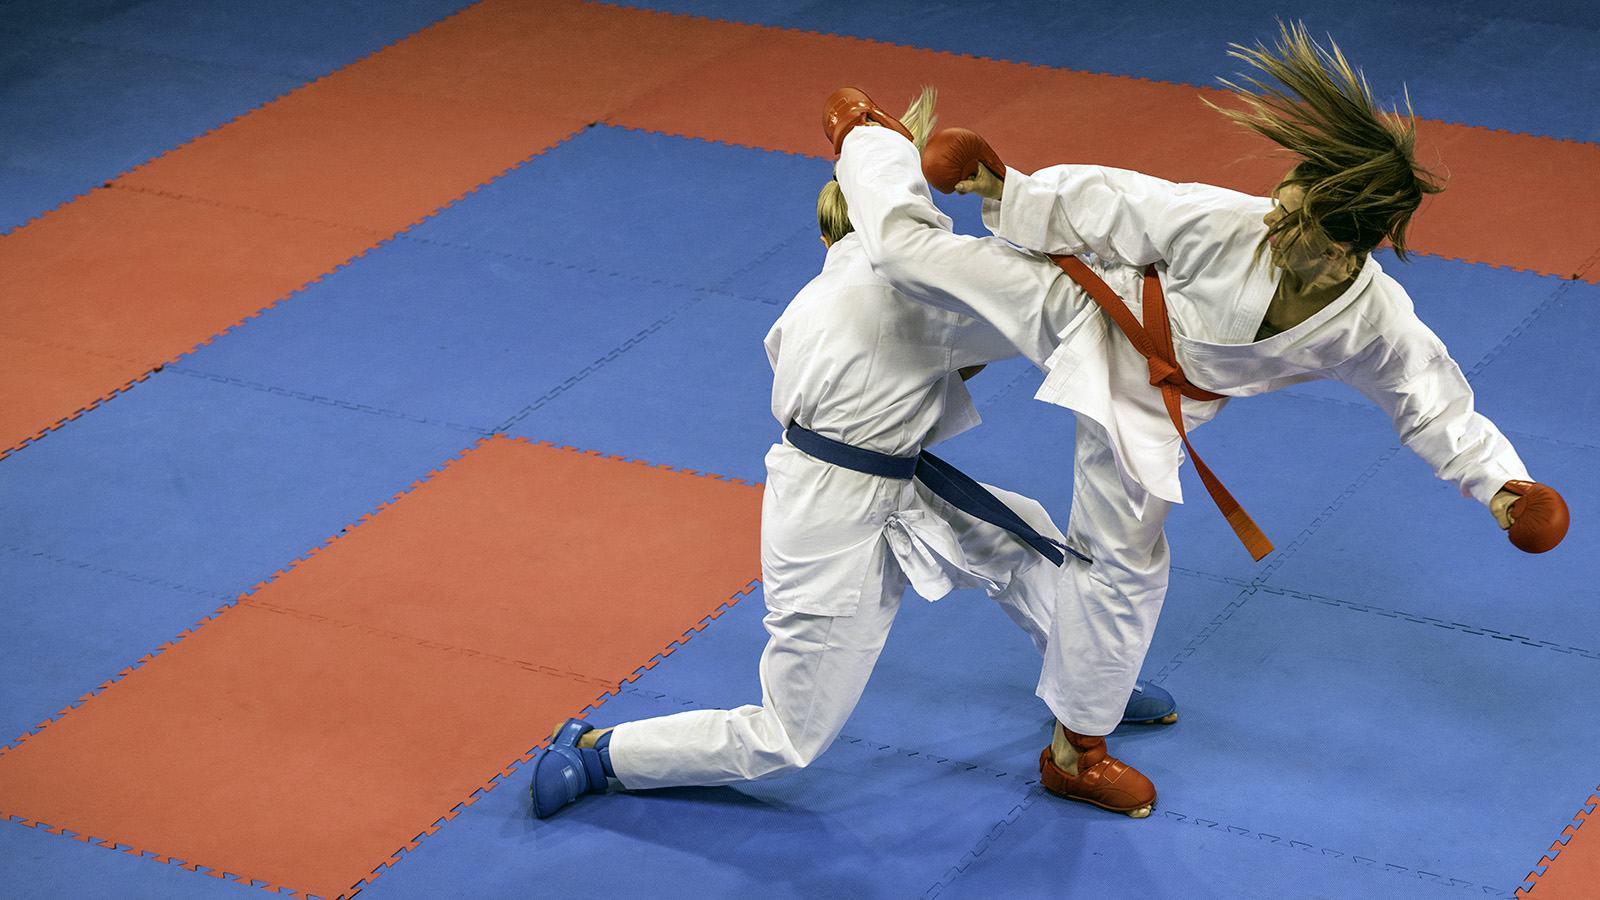 Taekwondo: The 'Sport' of Mastering Self-Control | HowStuffWorks